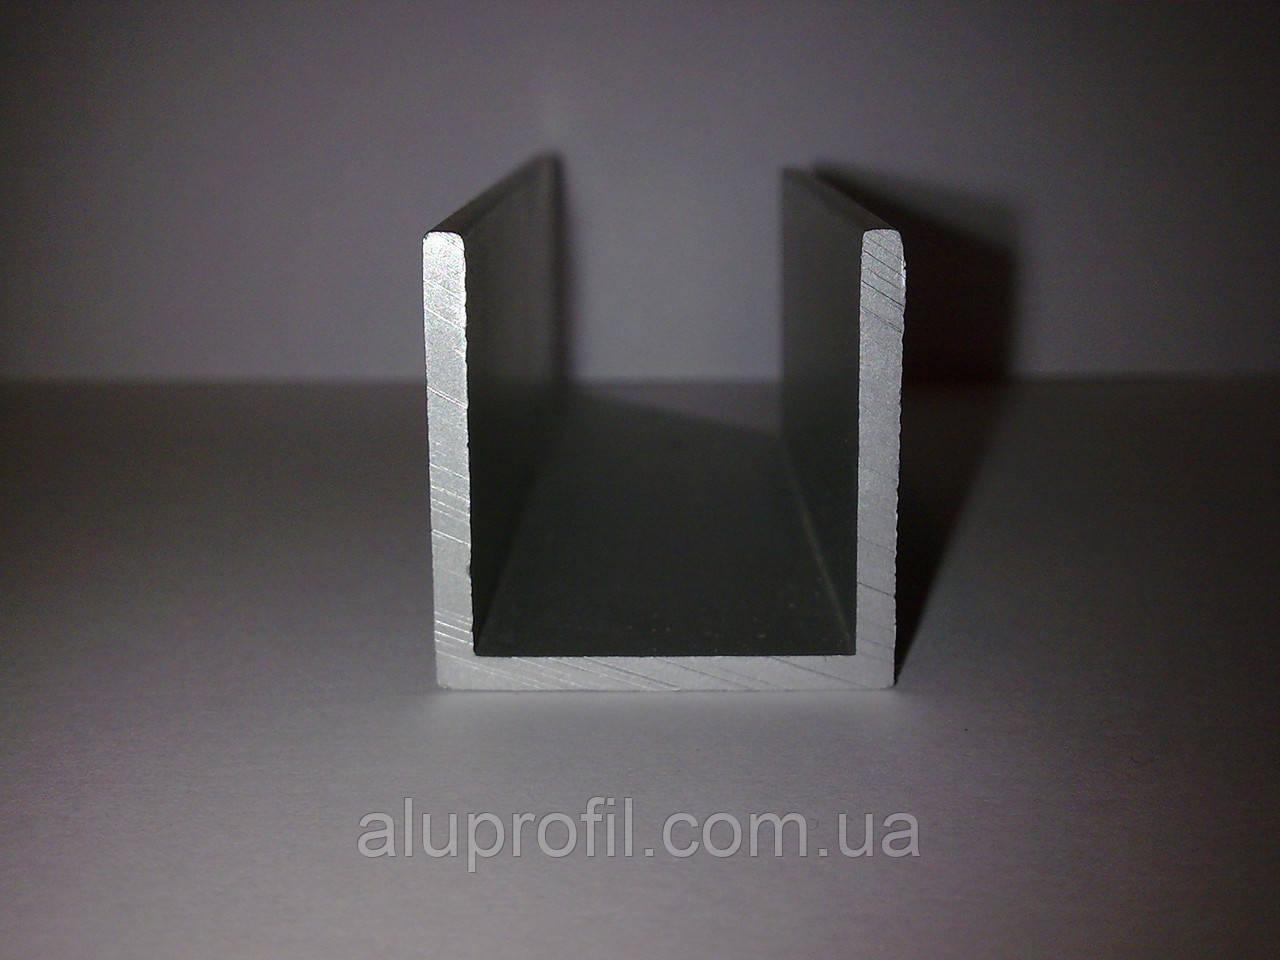 Алюминиевый профиль — п-образный алюминиевый профиль (швеллер) 19х19,7х1,5 Б/П